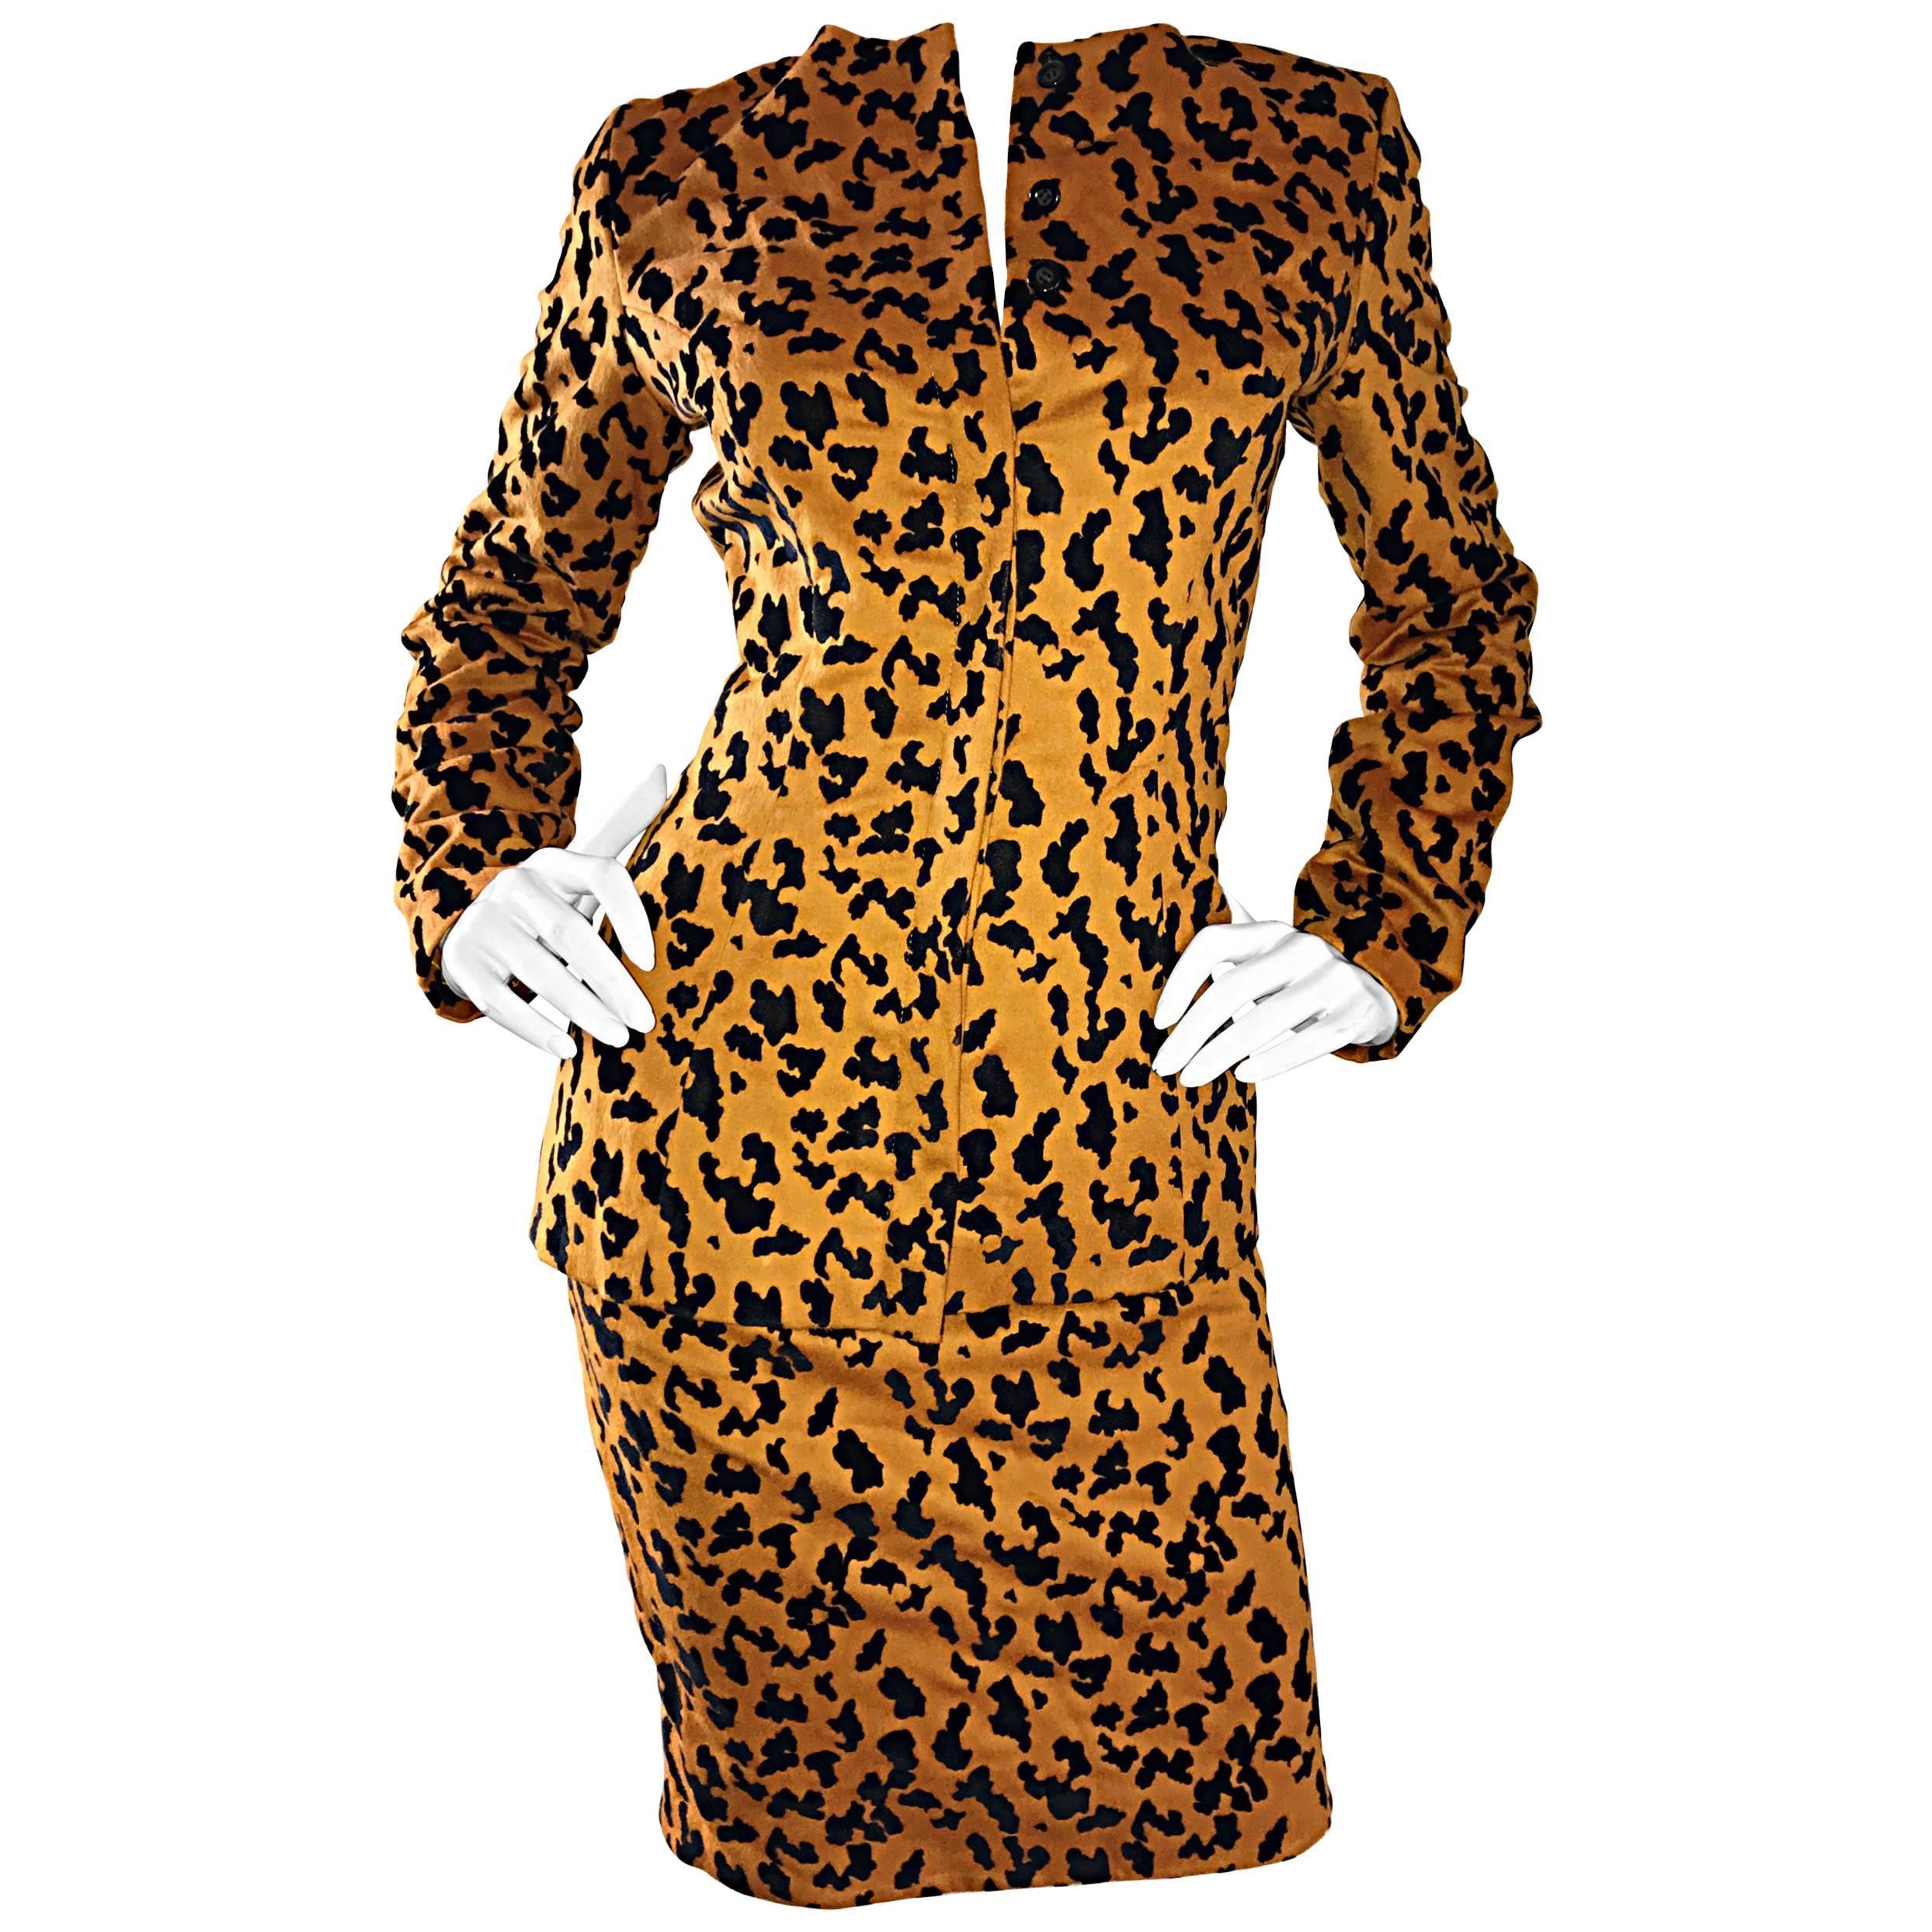 Vintage Vicky Tiel Couture Leopard Cheetah Print Wool Velvet 1980s Skirt Suit